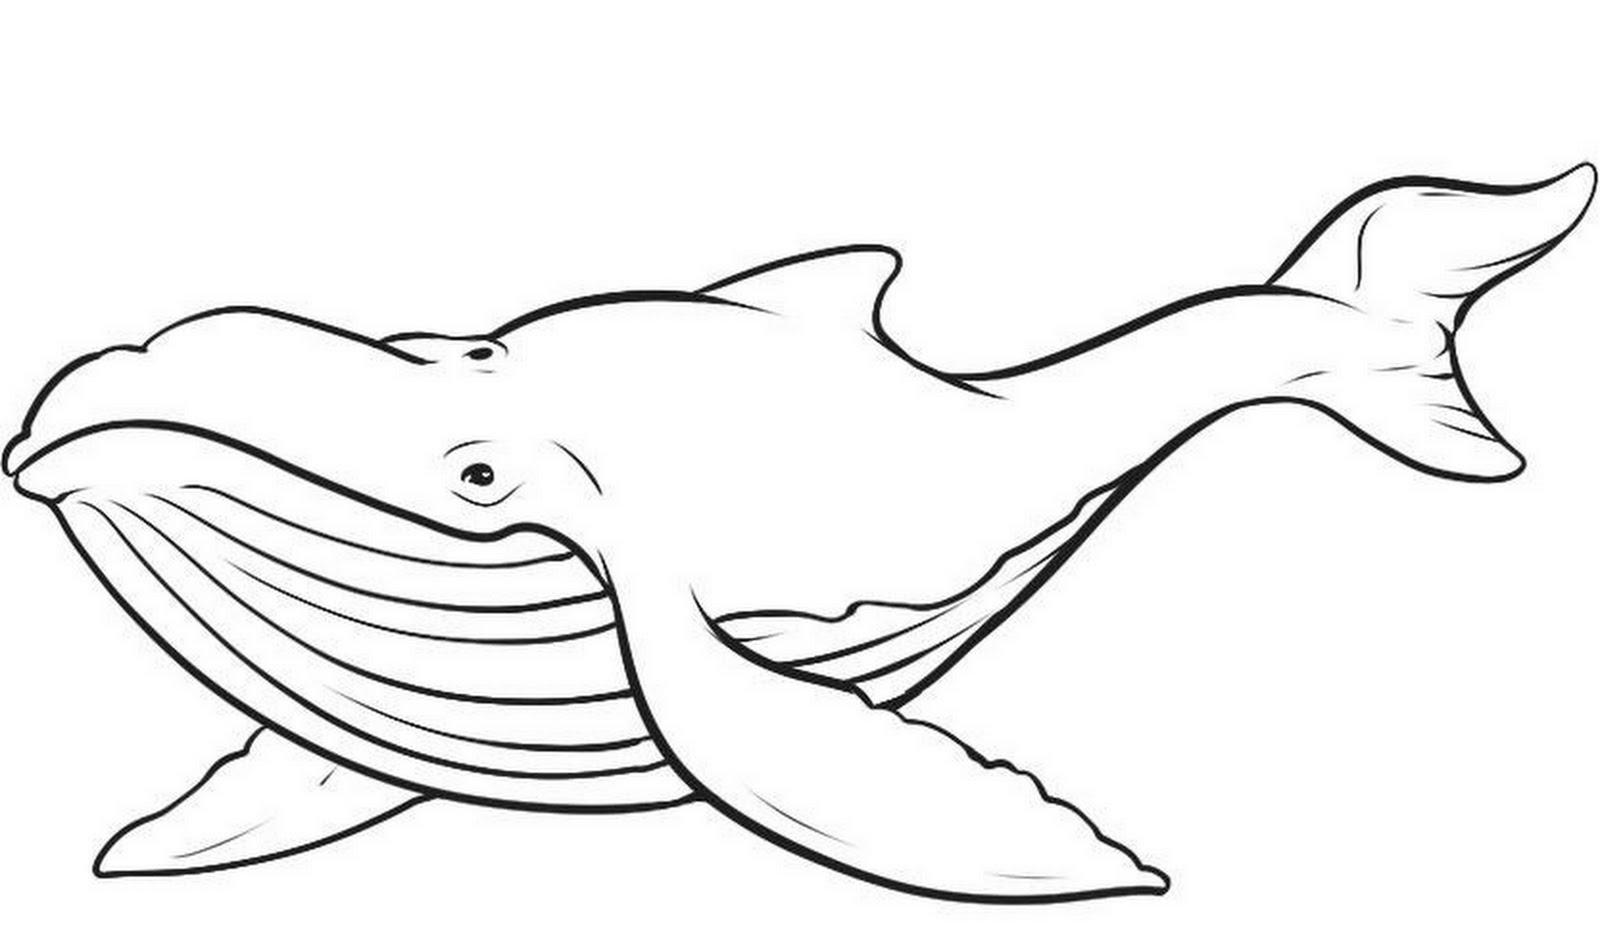 Humpback Whale Vector Clipart Panda Free-Humpback Whale Vector Clipart Panda Free Clipart Images-8